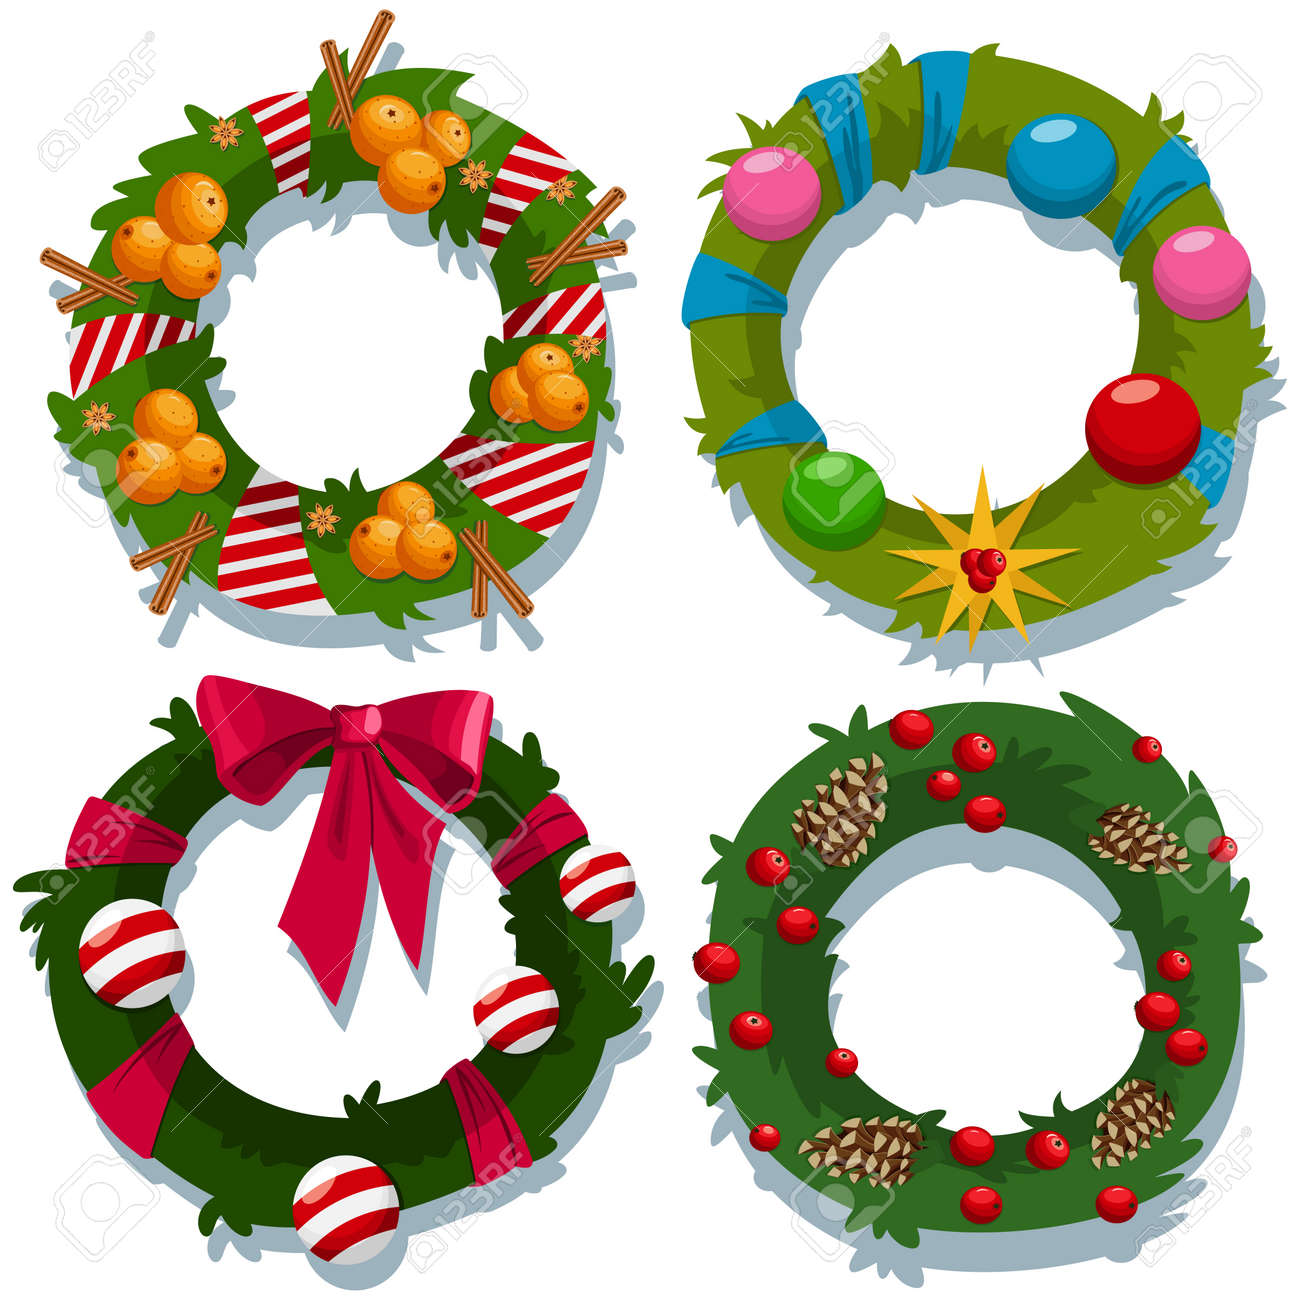 Christmas Wreath Vector Cartoon Decorative Holiday Elements Set